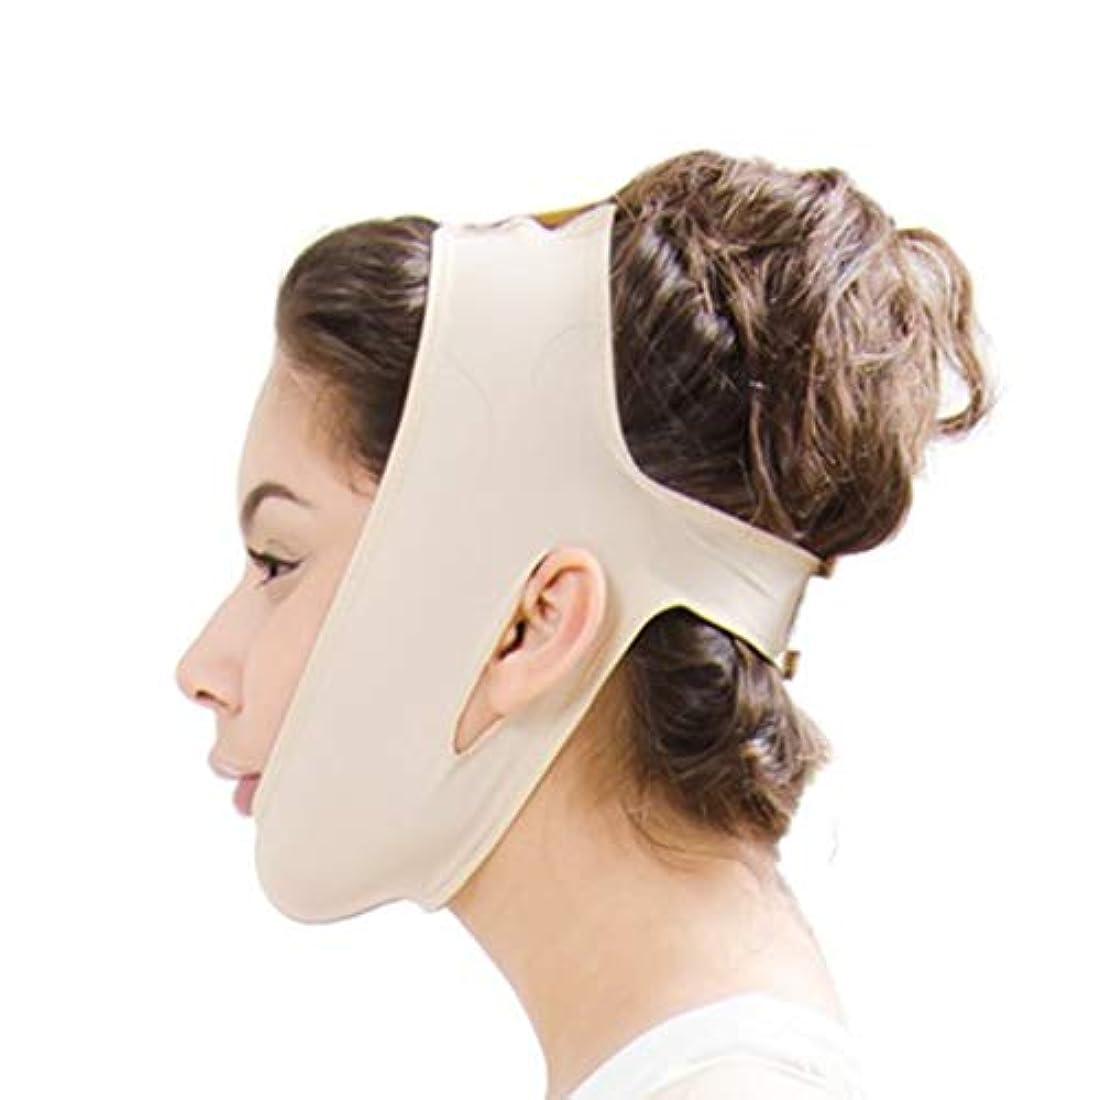 XHLMRMJ フェイスリフトマスク、圧縮後の顎顔面二重あご化粧品脂肪吸引小さな顔包帯弾性ヘッドギア (Size : XXL)